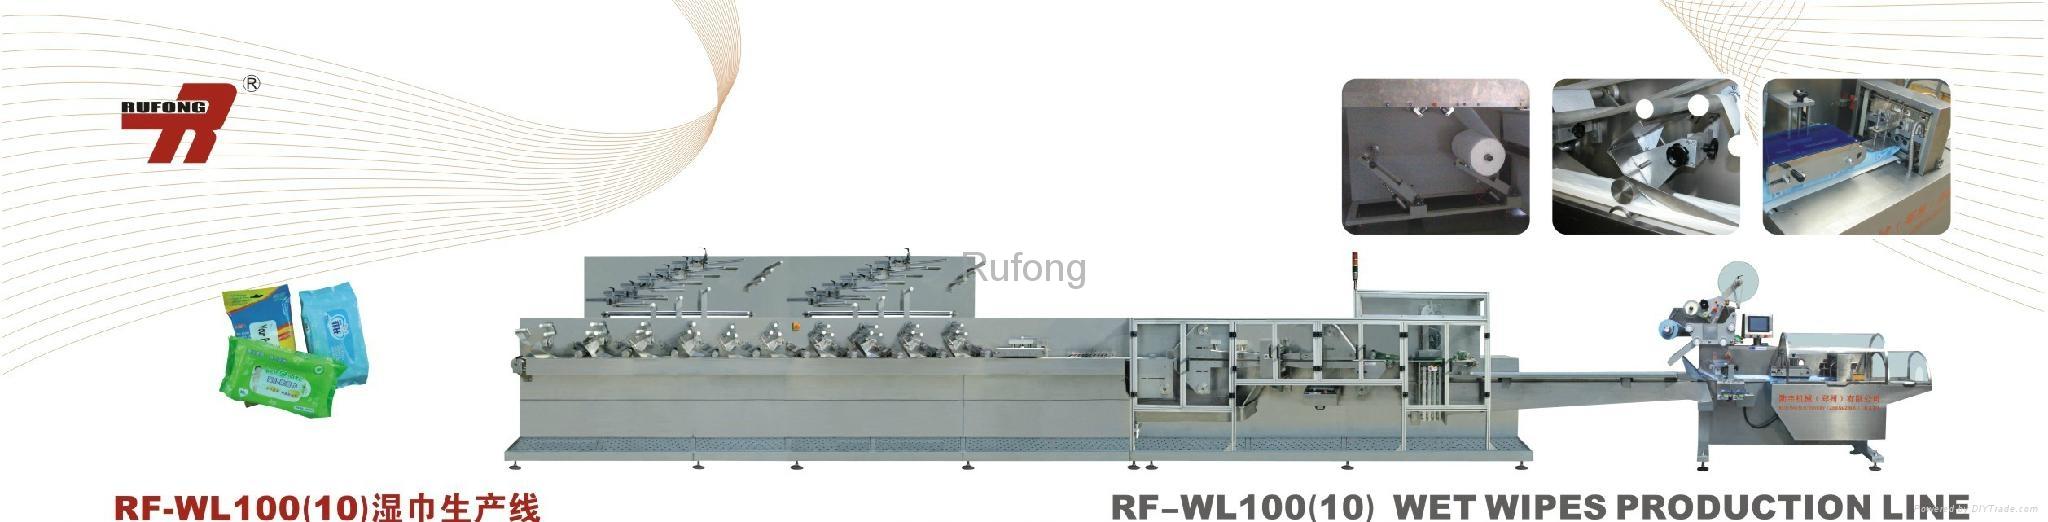 RF-WL100(10) Wet Wipes Production Line 3